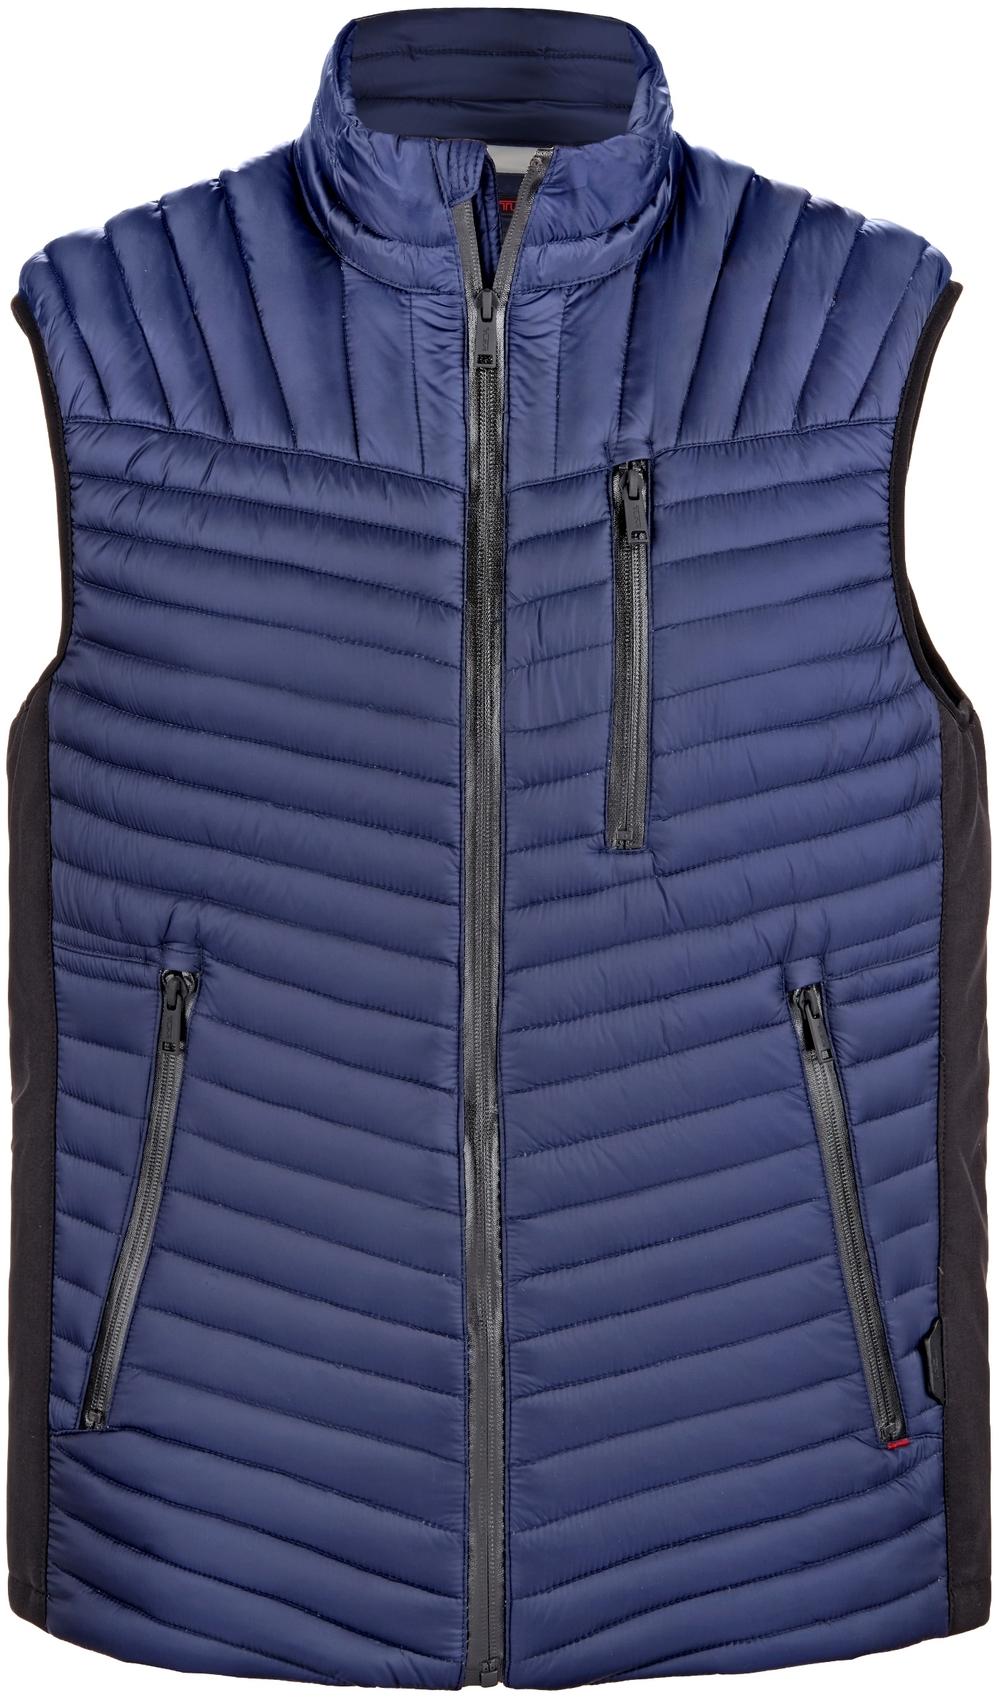 Tumi On-The-Go Vest, $295